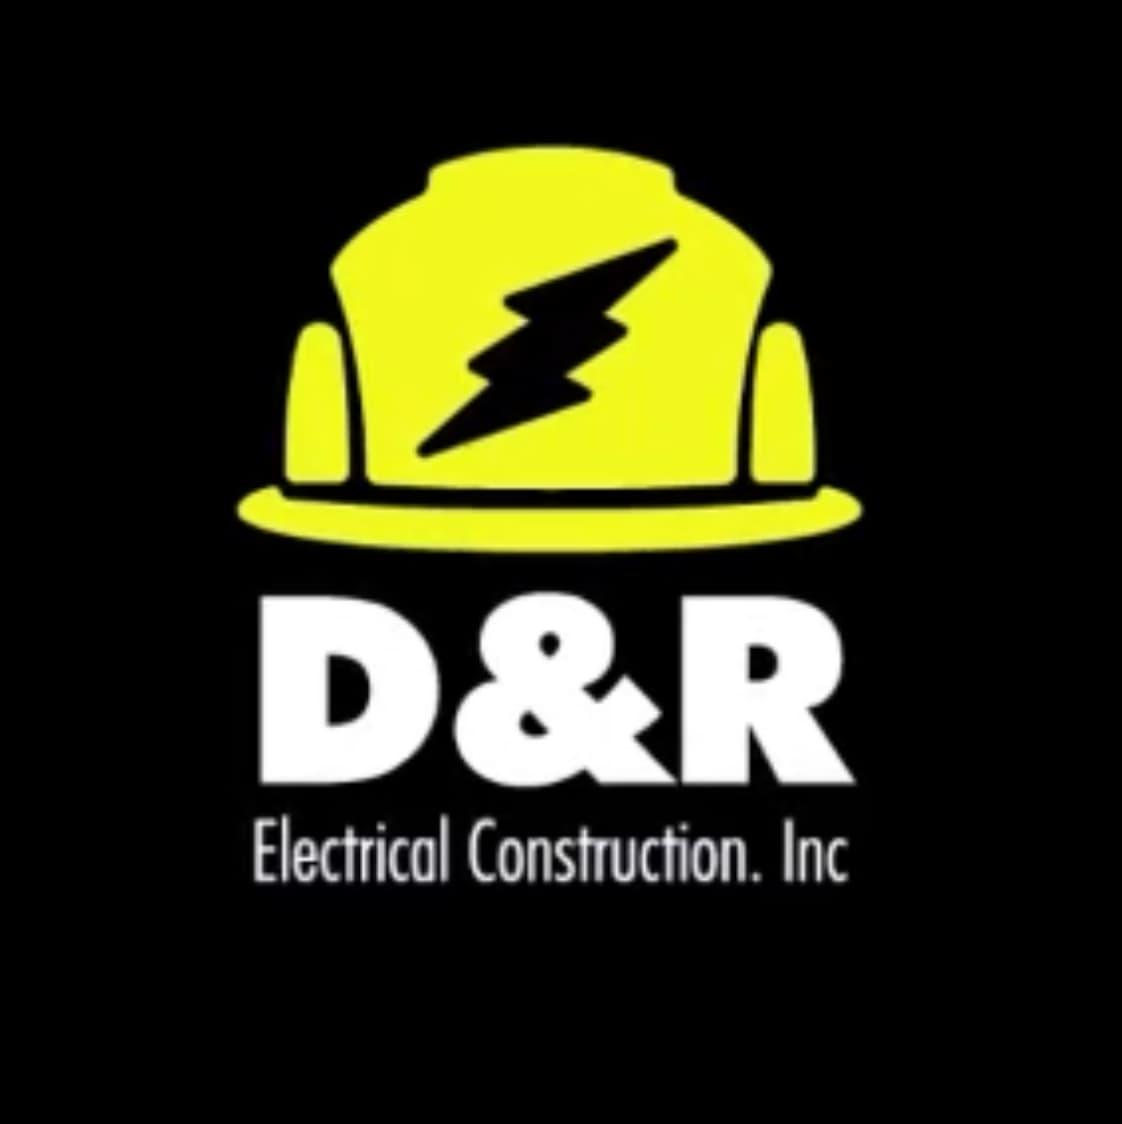 D&R Electrical Construction